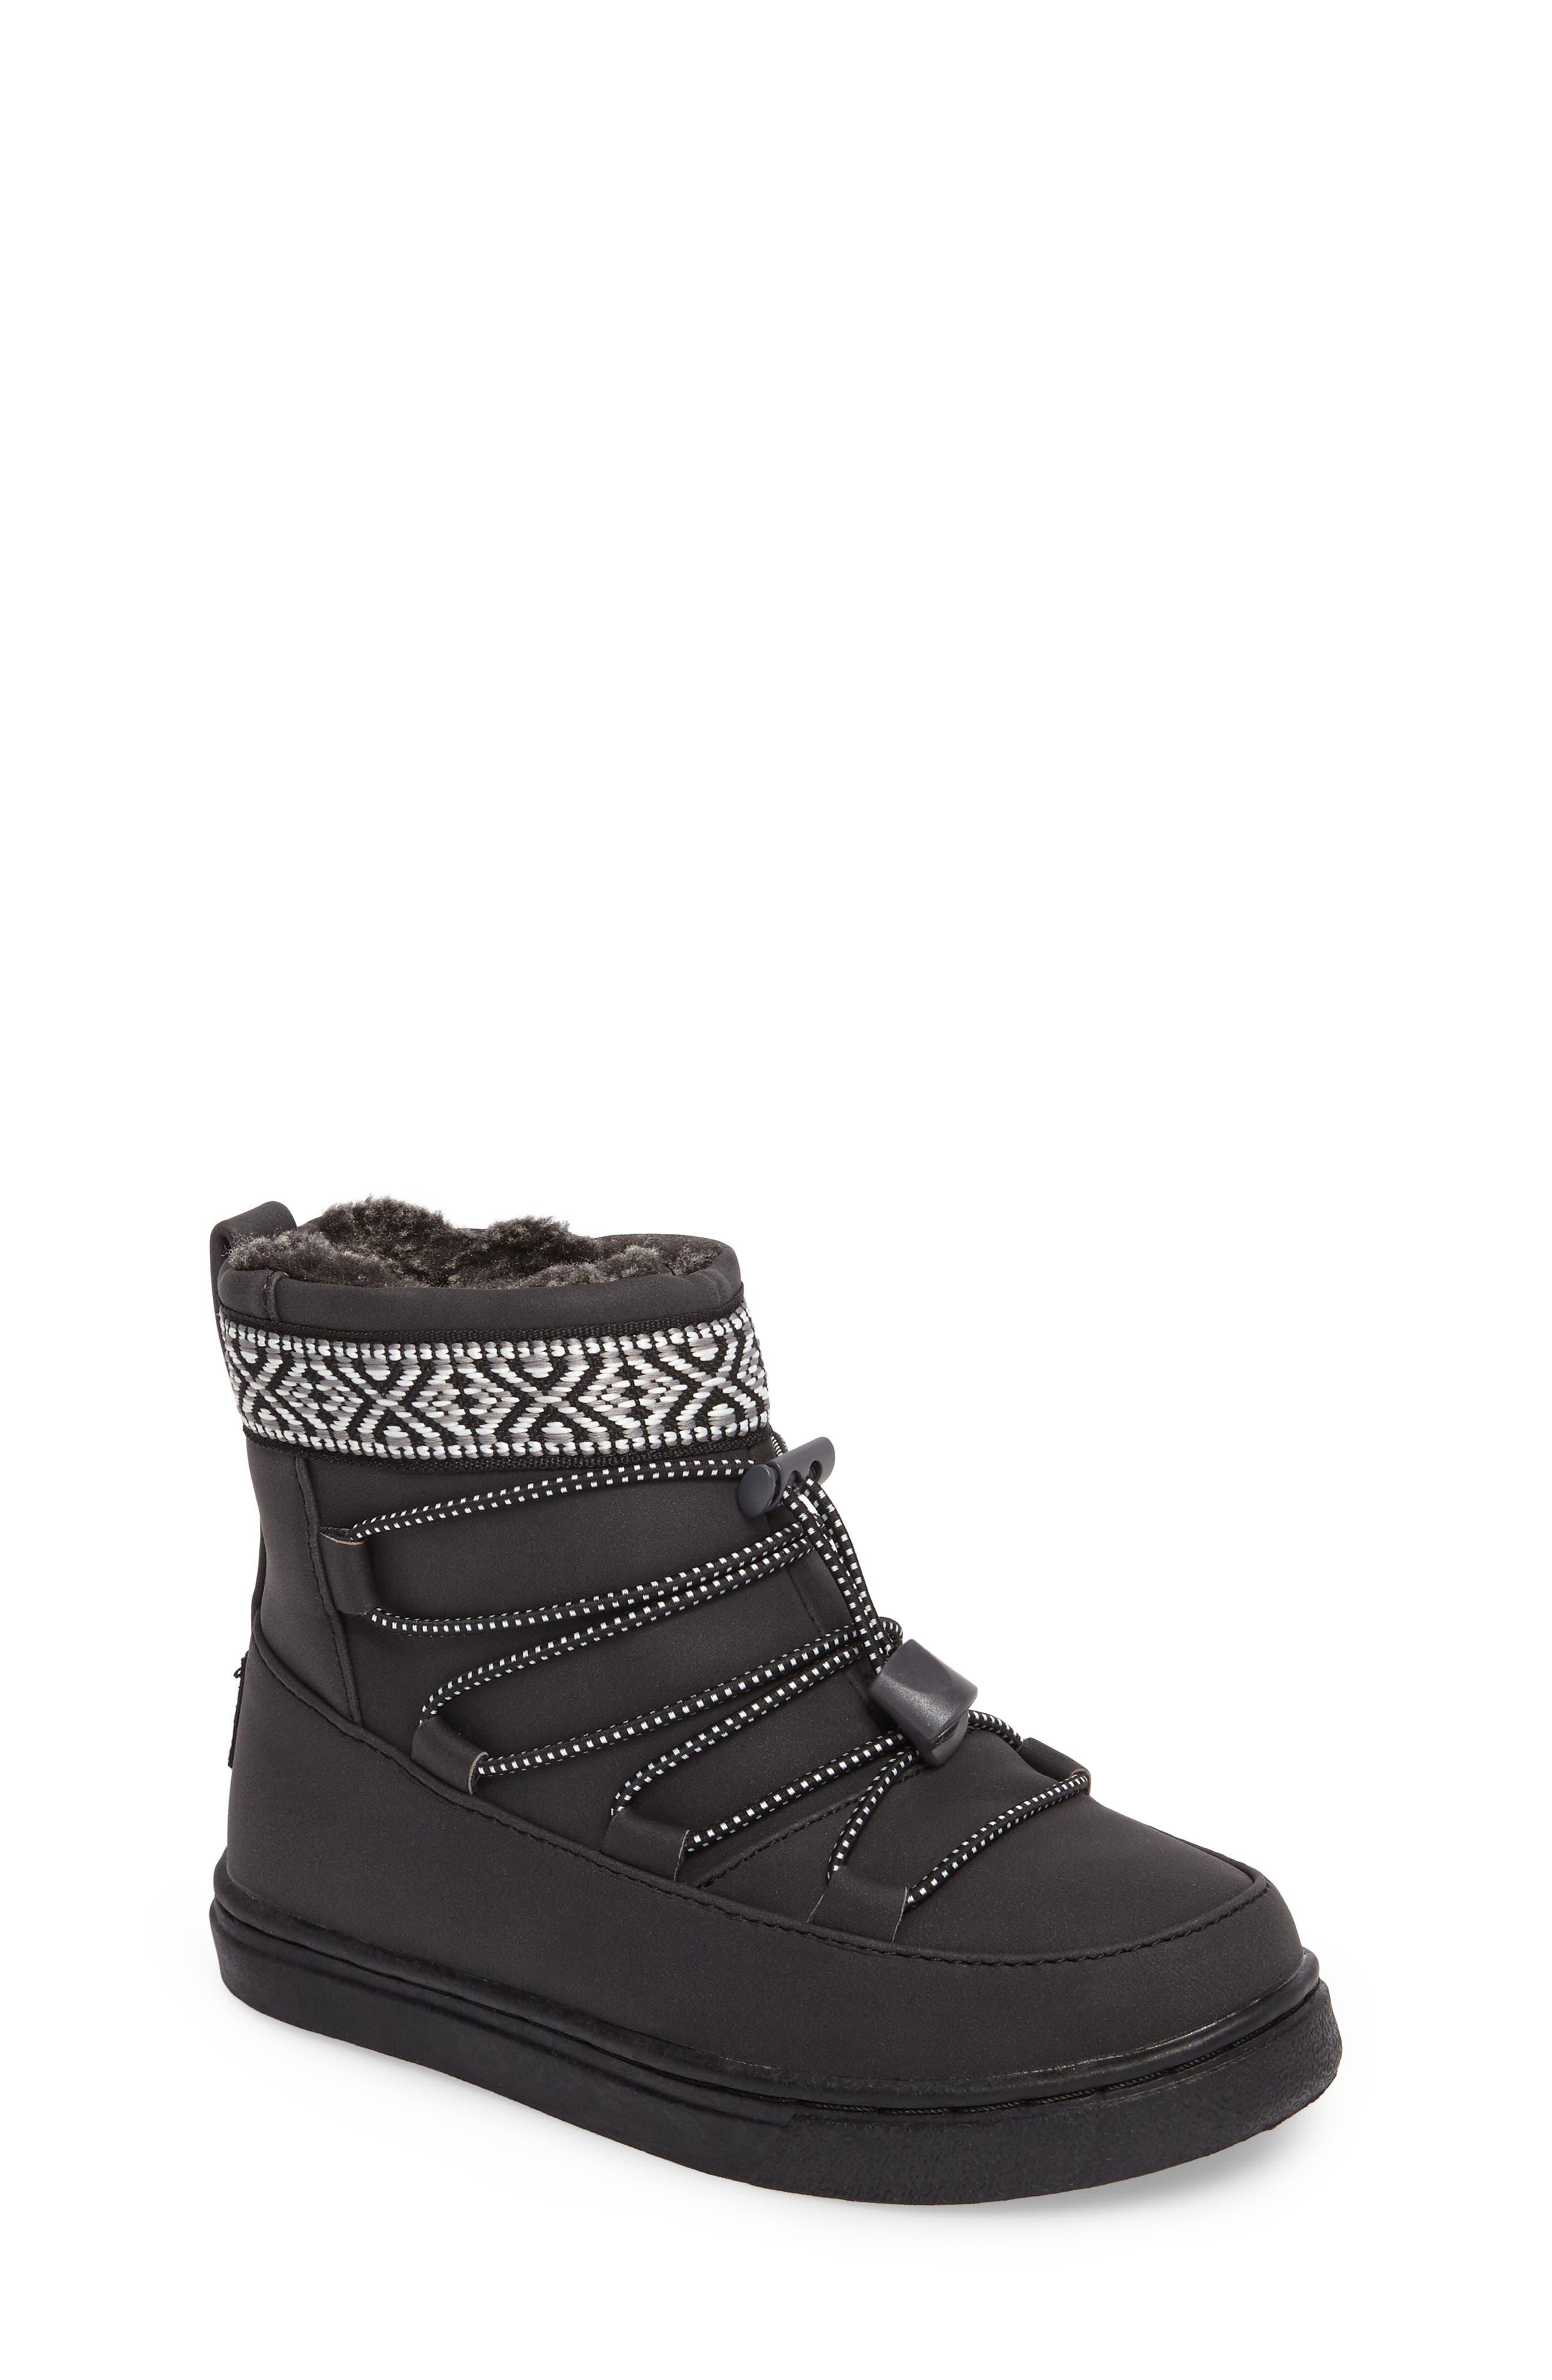 Alpine Boot,                         Main,                         color,